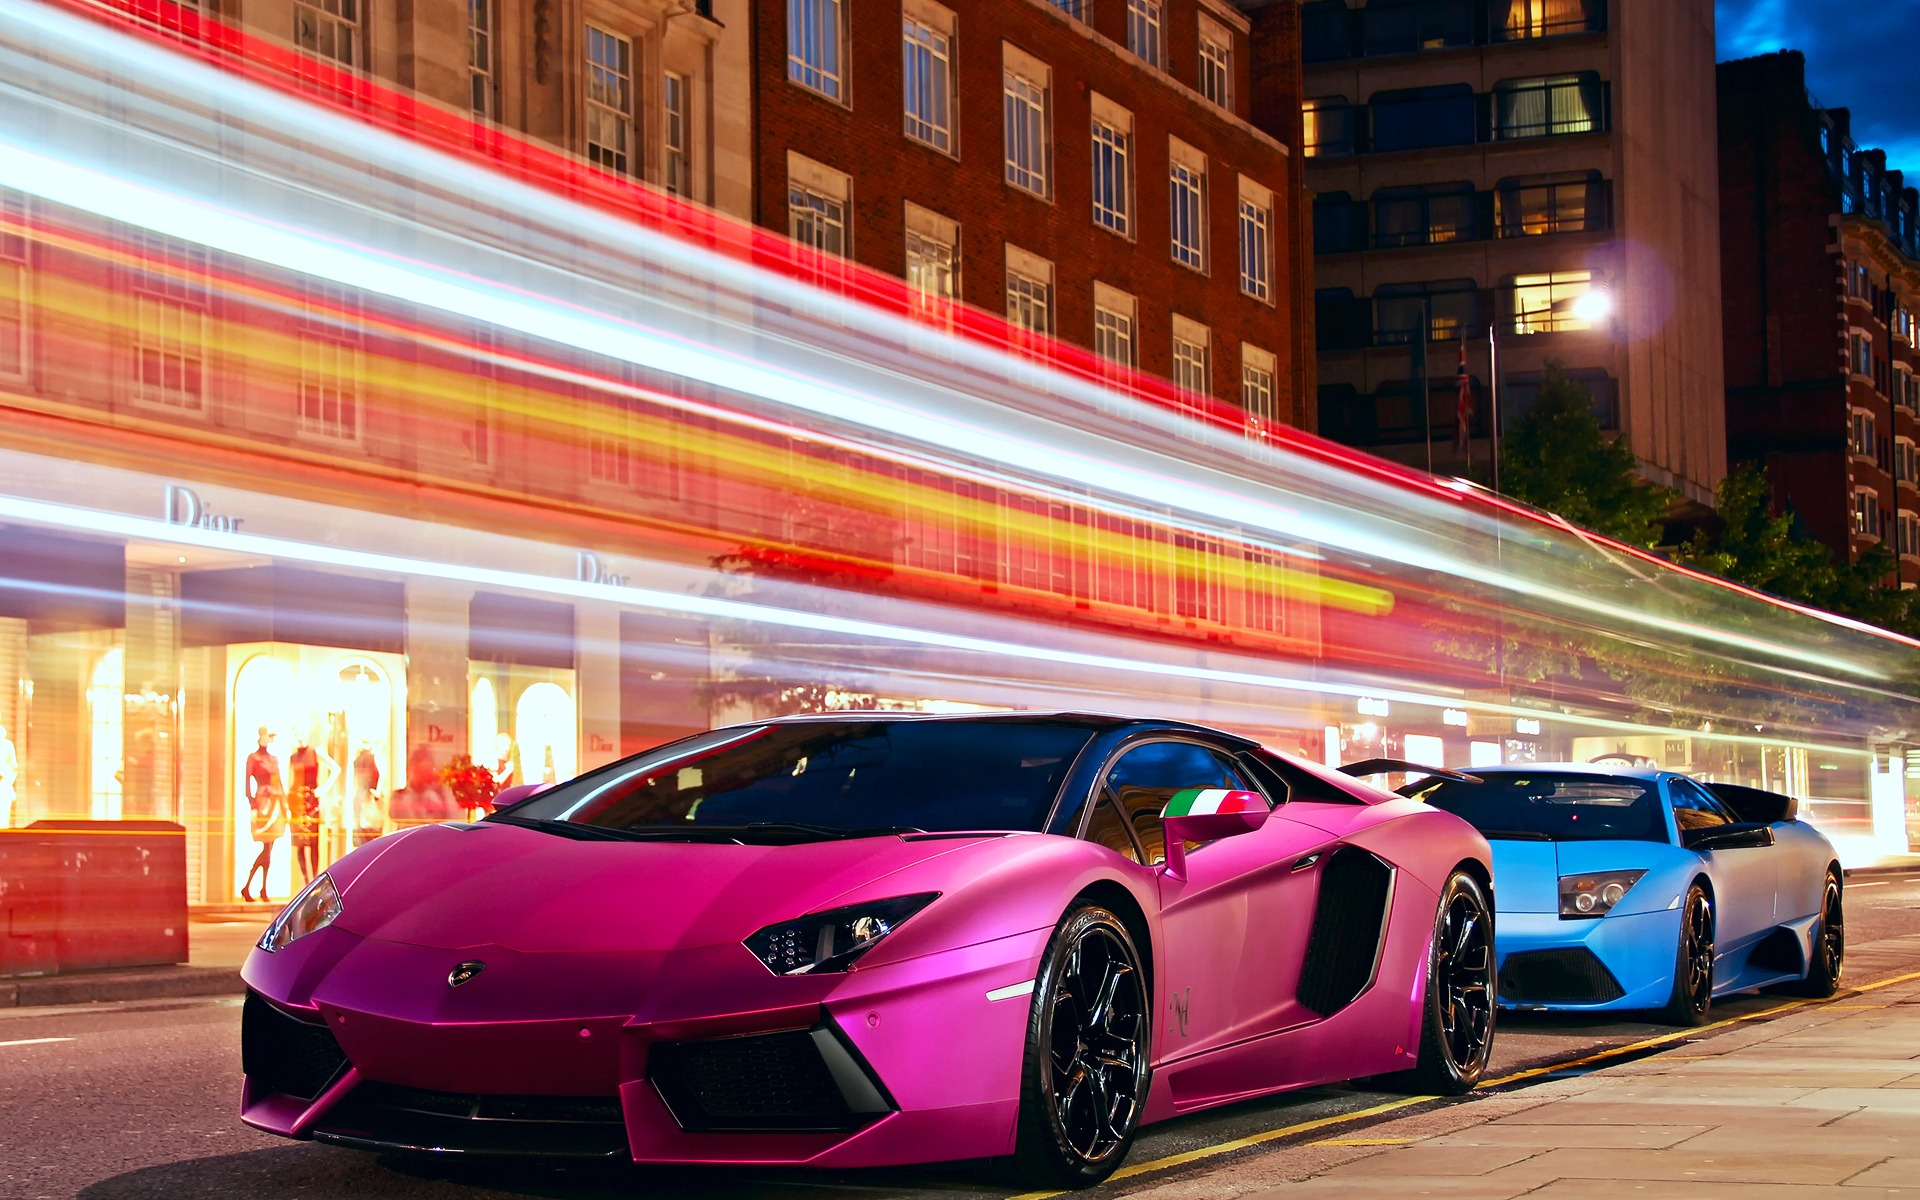 Pink Lamborghini City